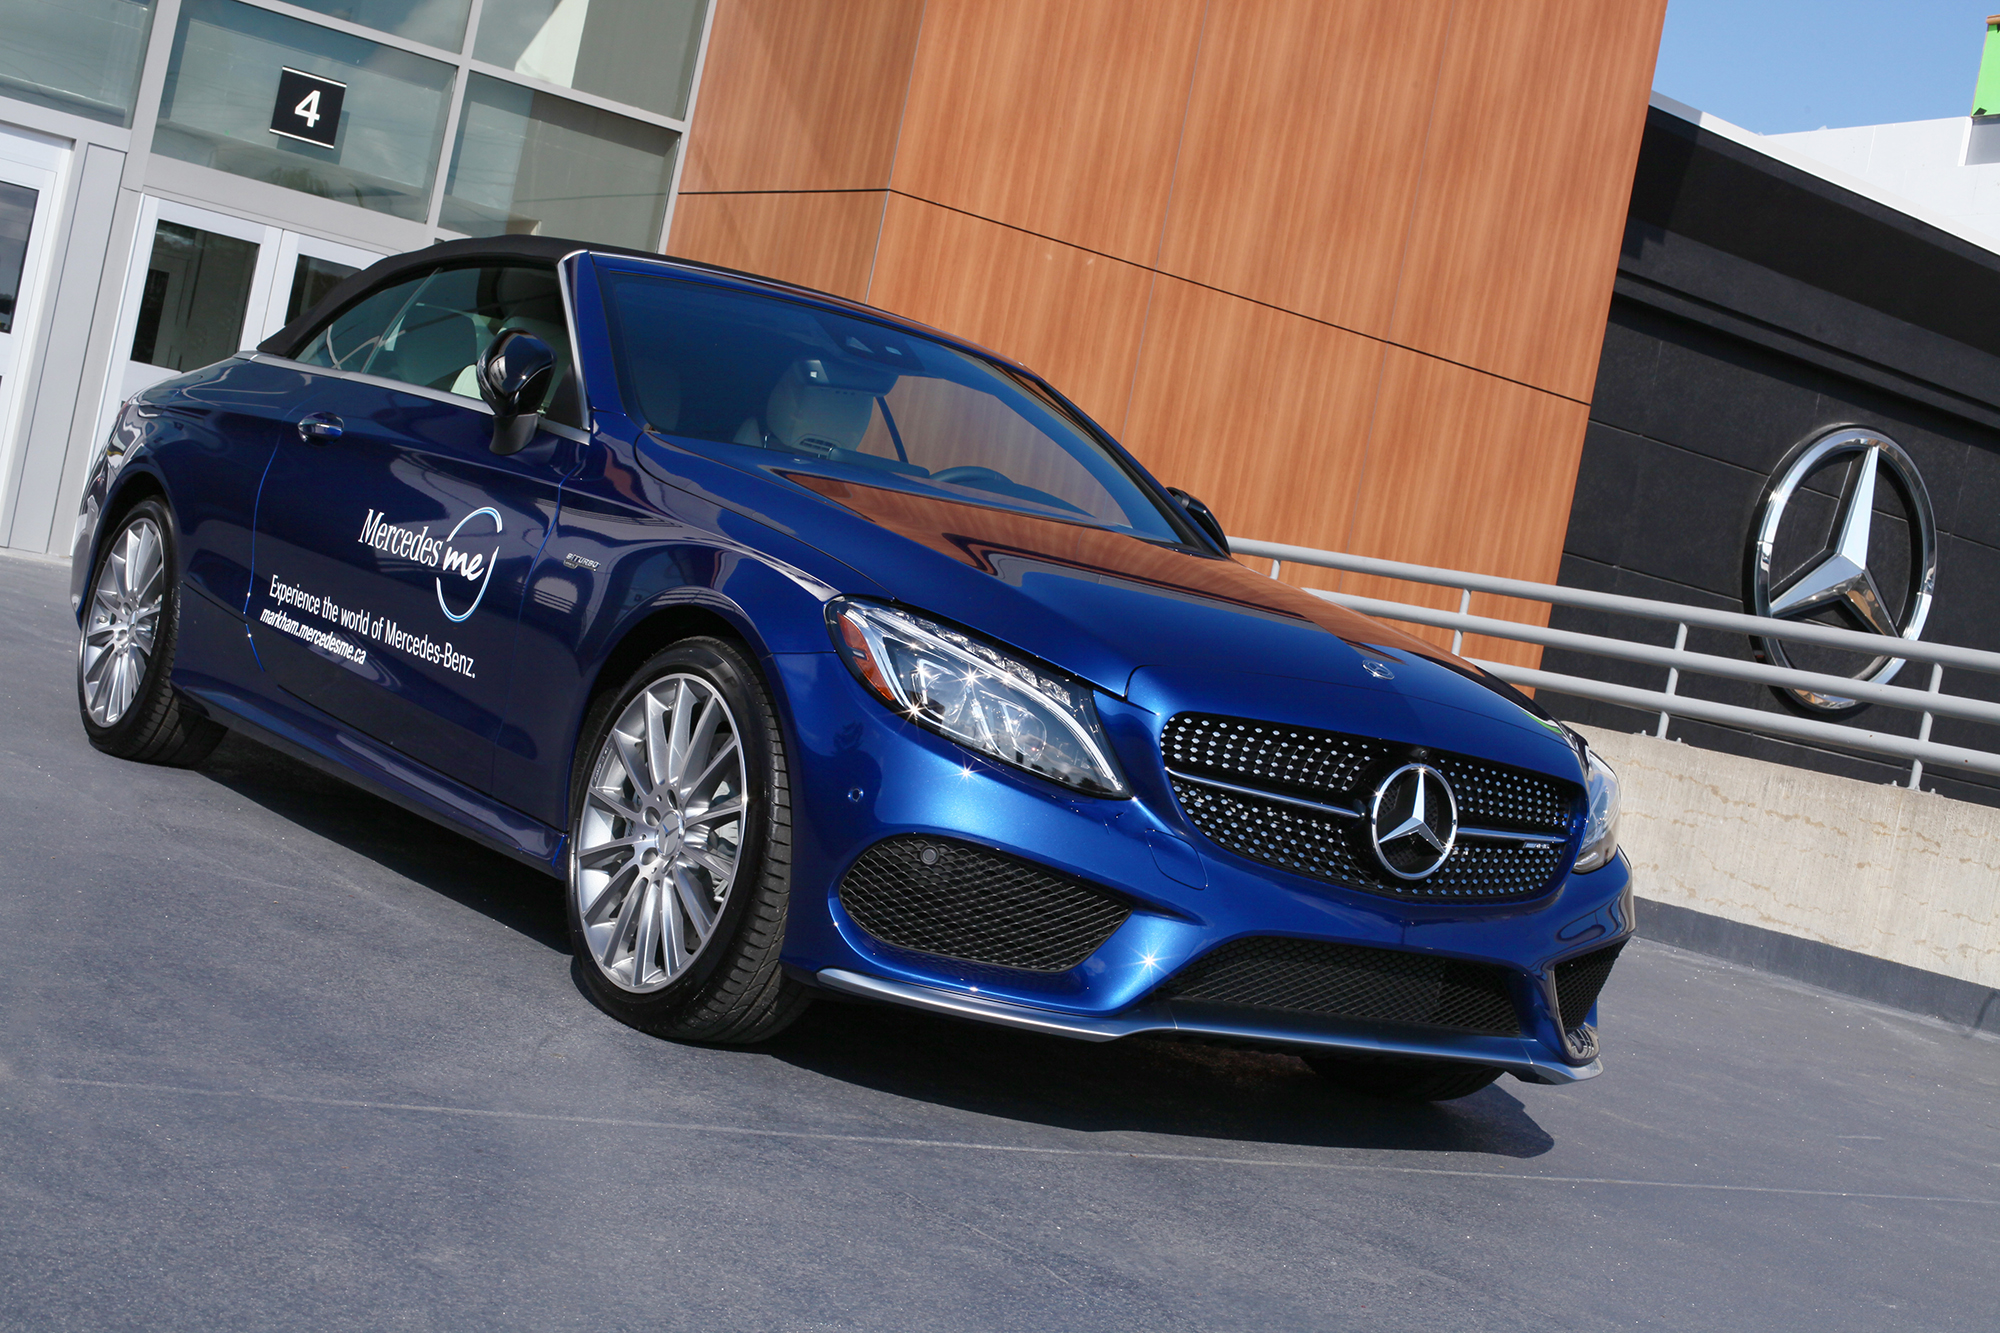 Mercedes benz canada introduces mercedes me retail space for Mercedes benz canda